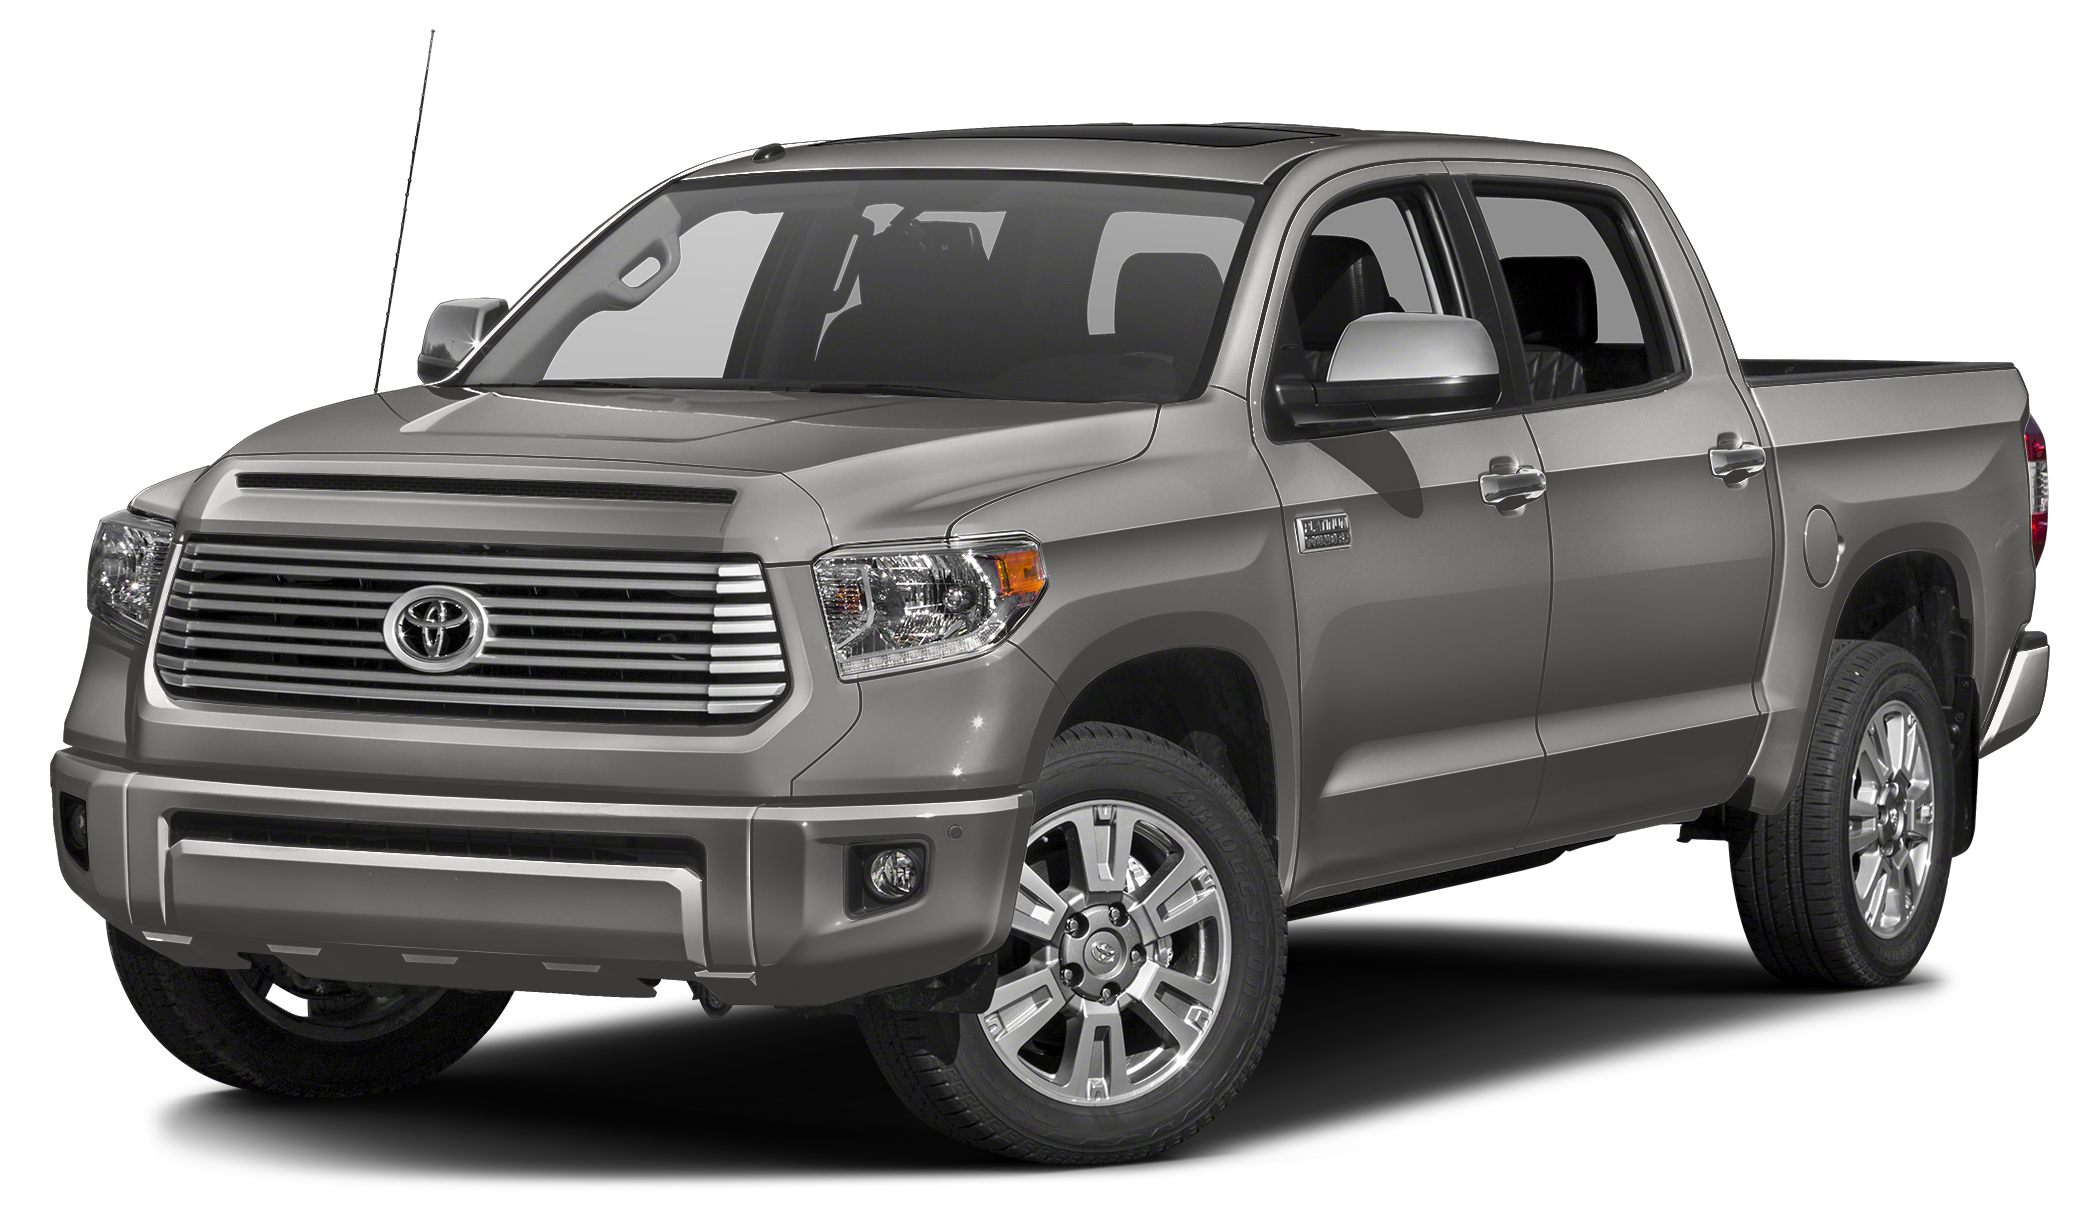 2016 Toyota Tundra Platinum Miles 0Color Silver Sky Metallic Stock 05487 VIN 5TFGW5F19GX2054